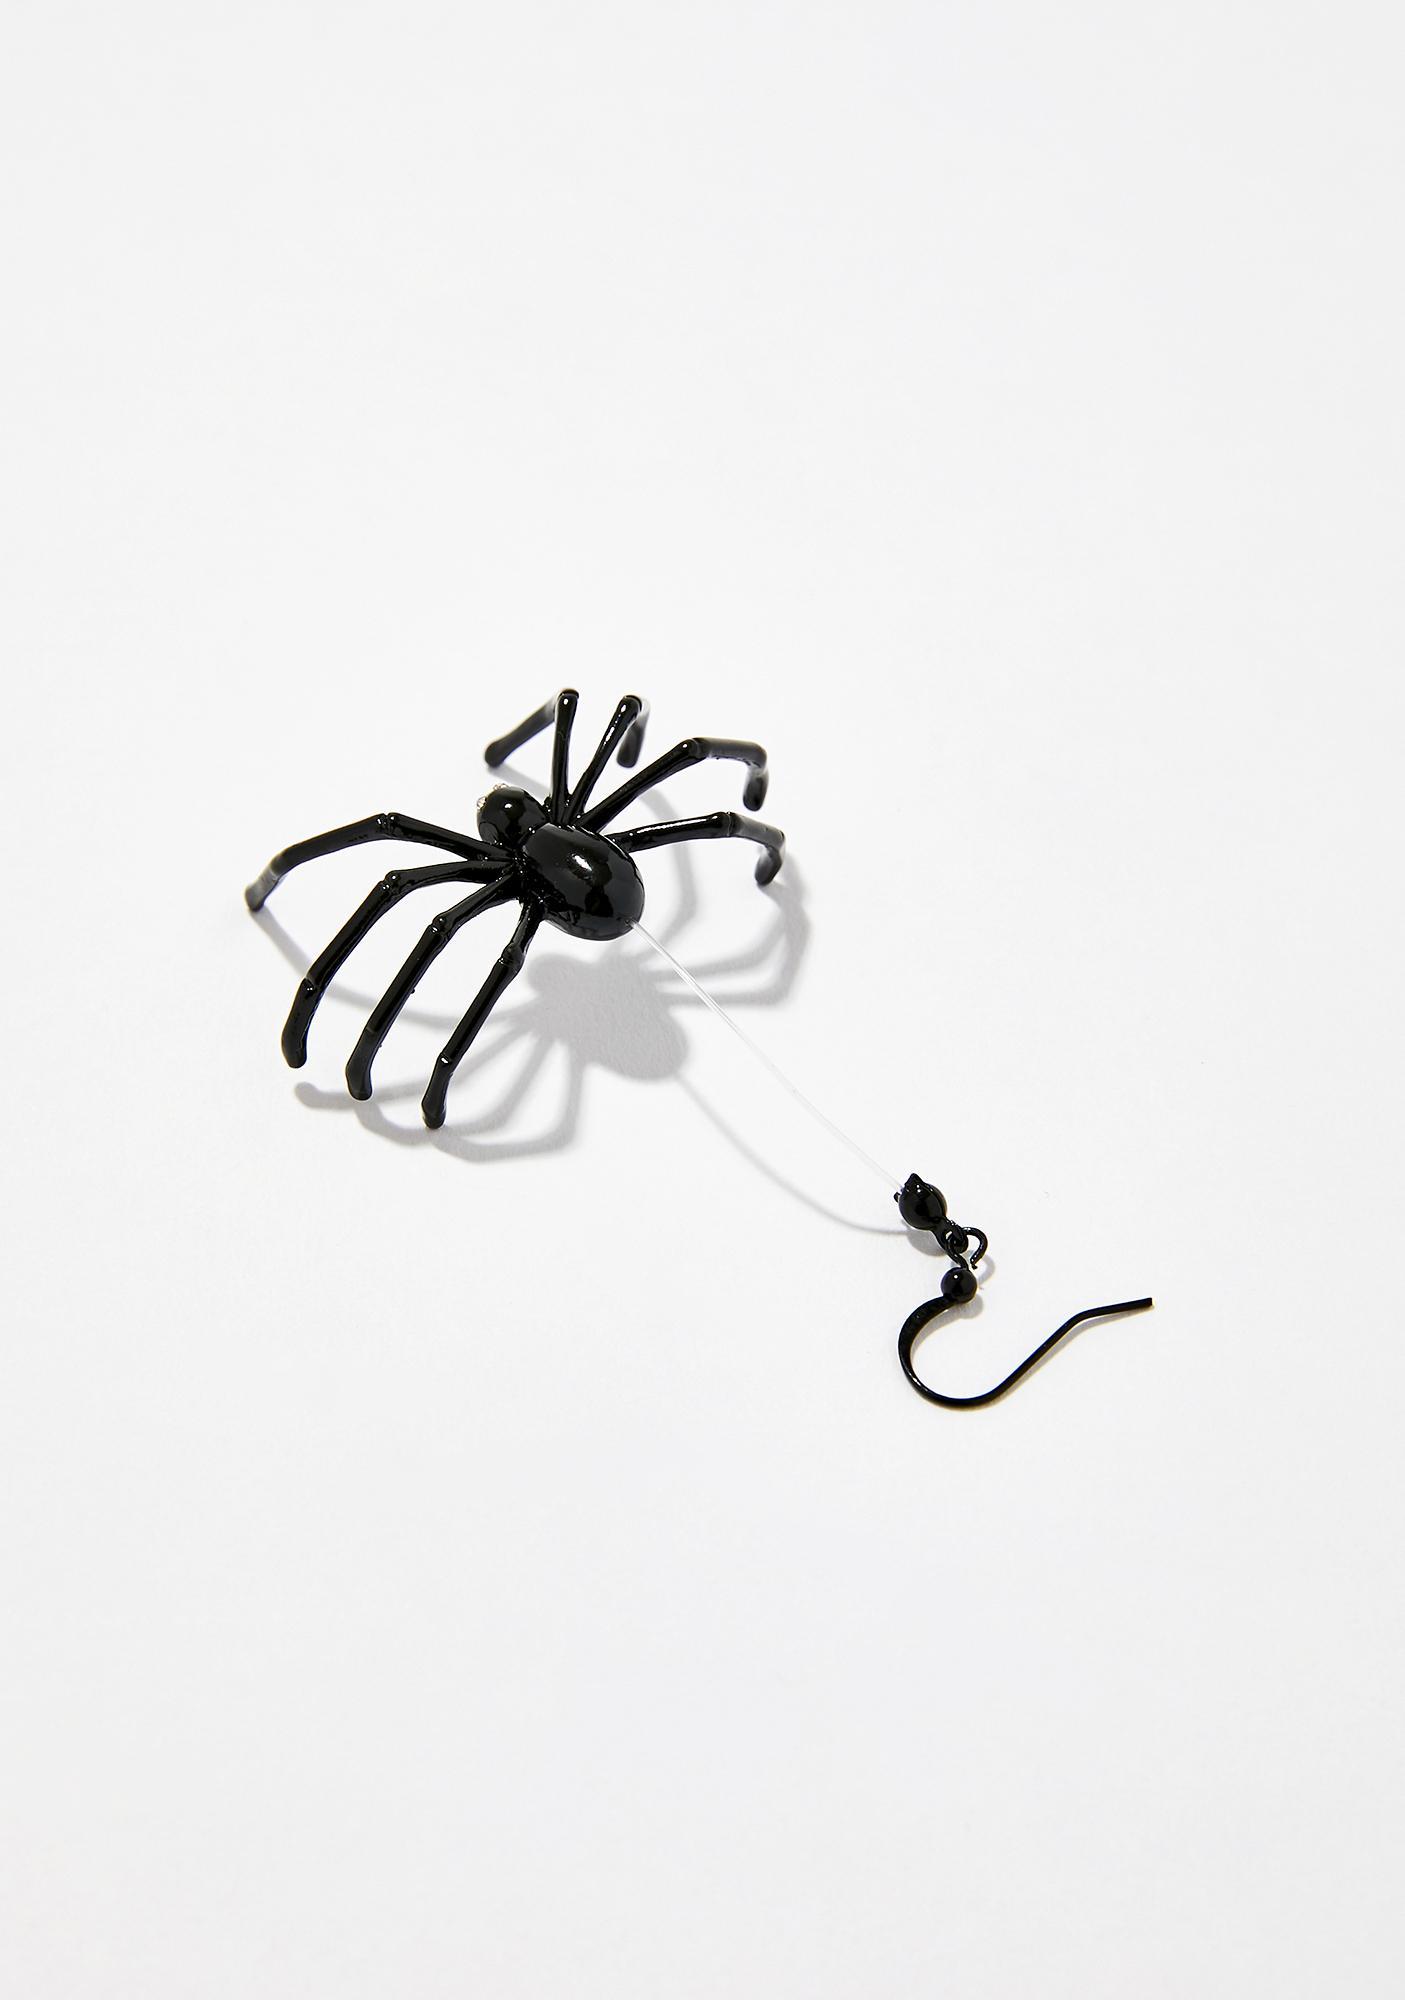 Mami Long Legs Spider Earrings